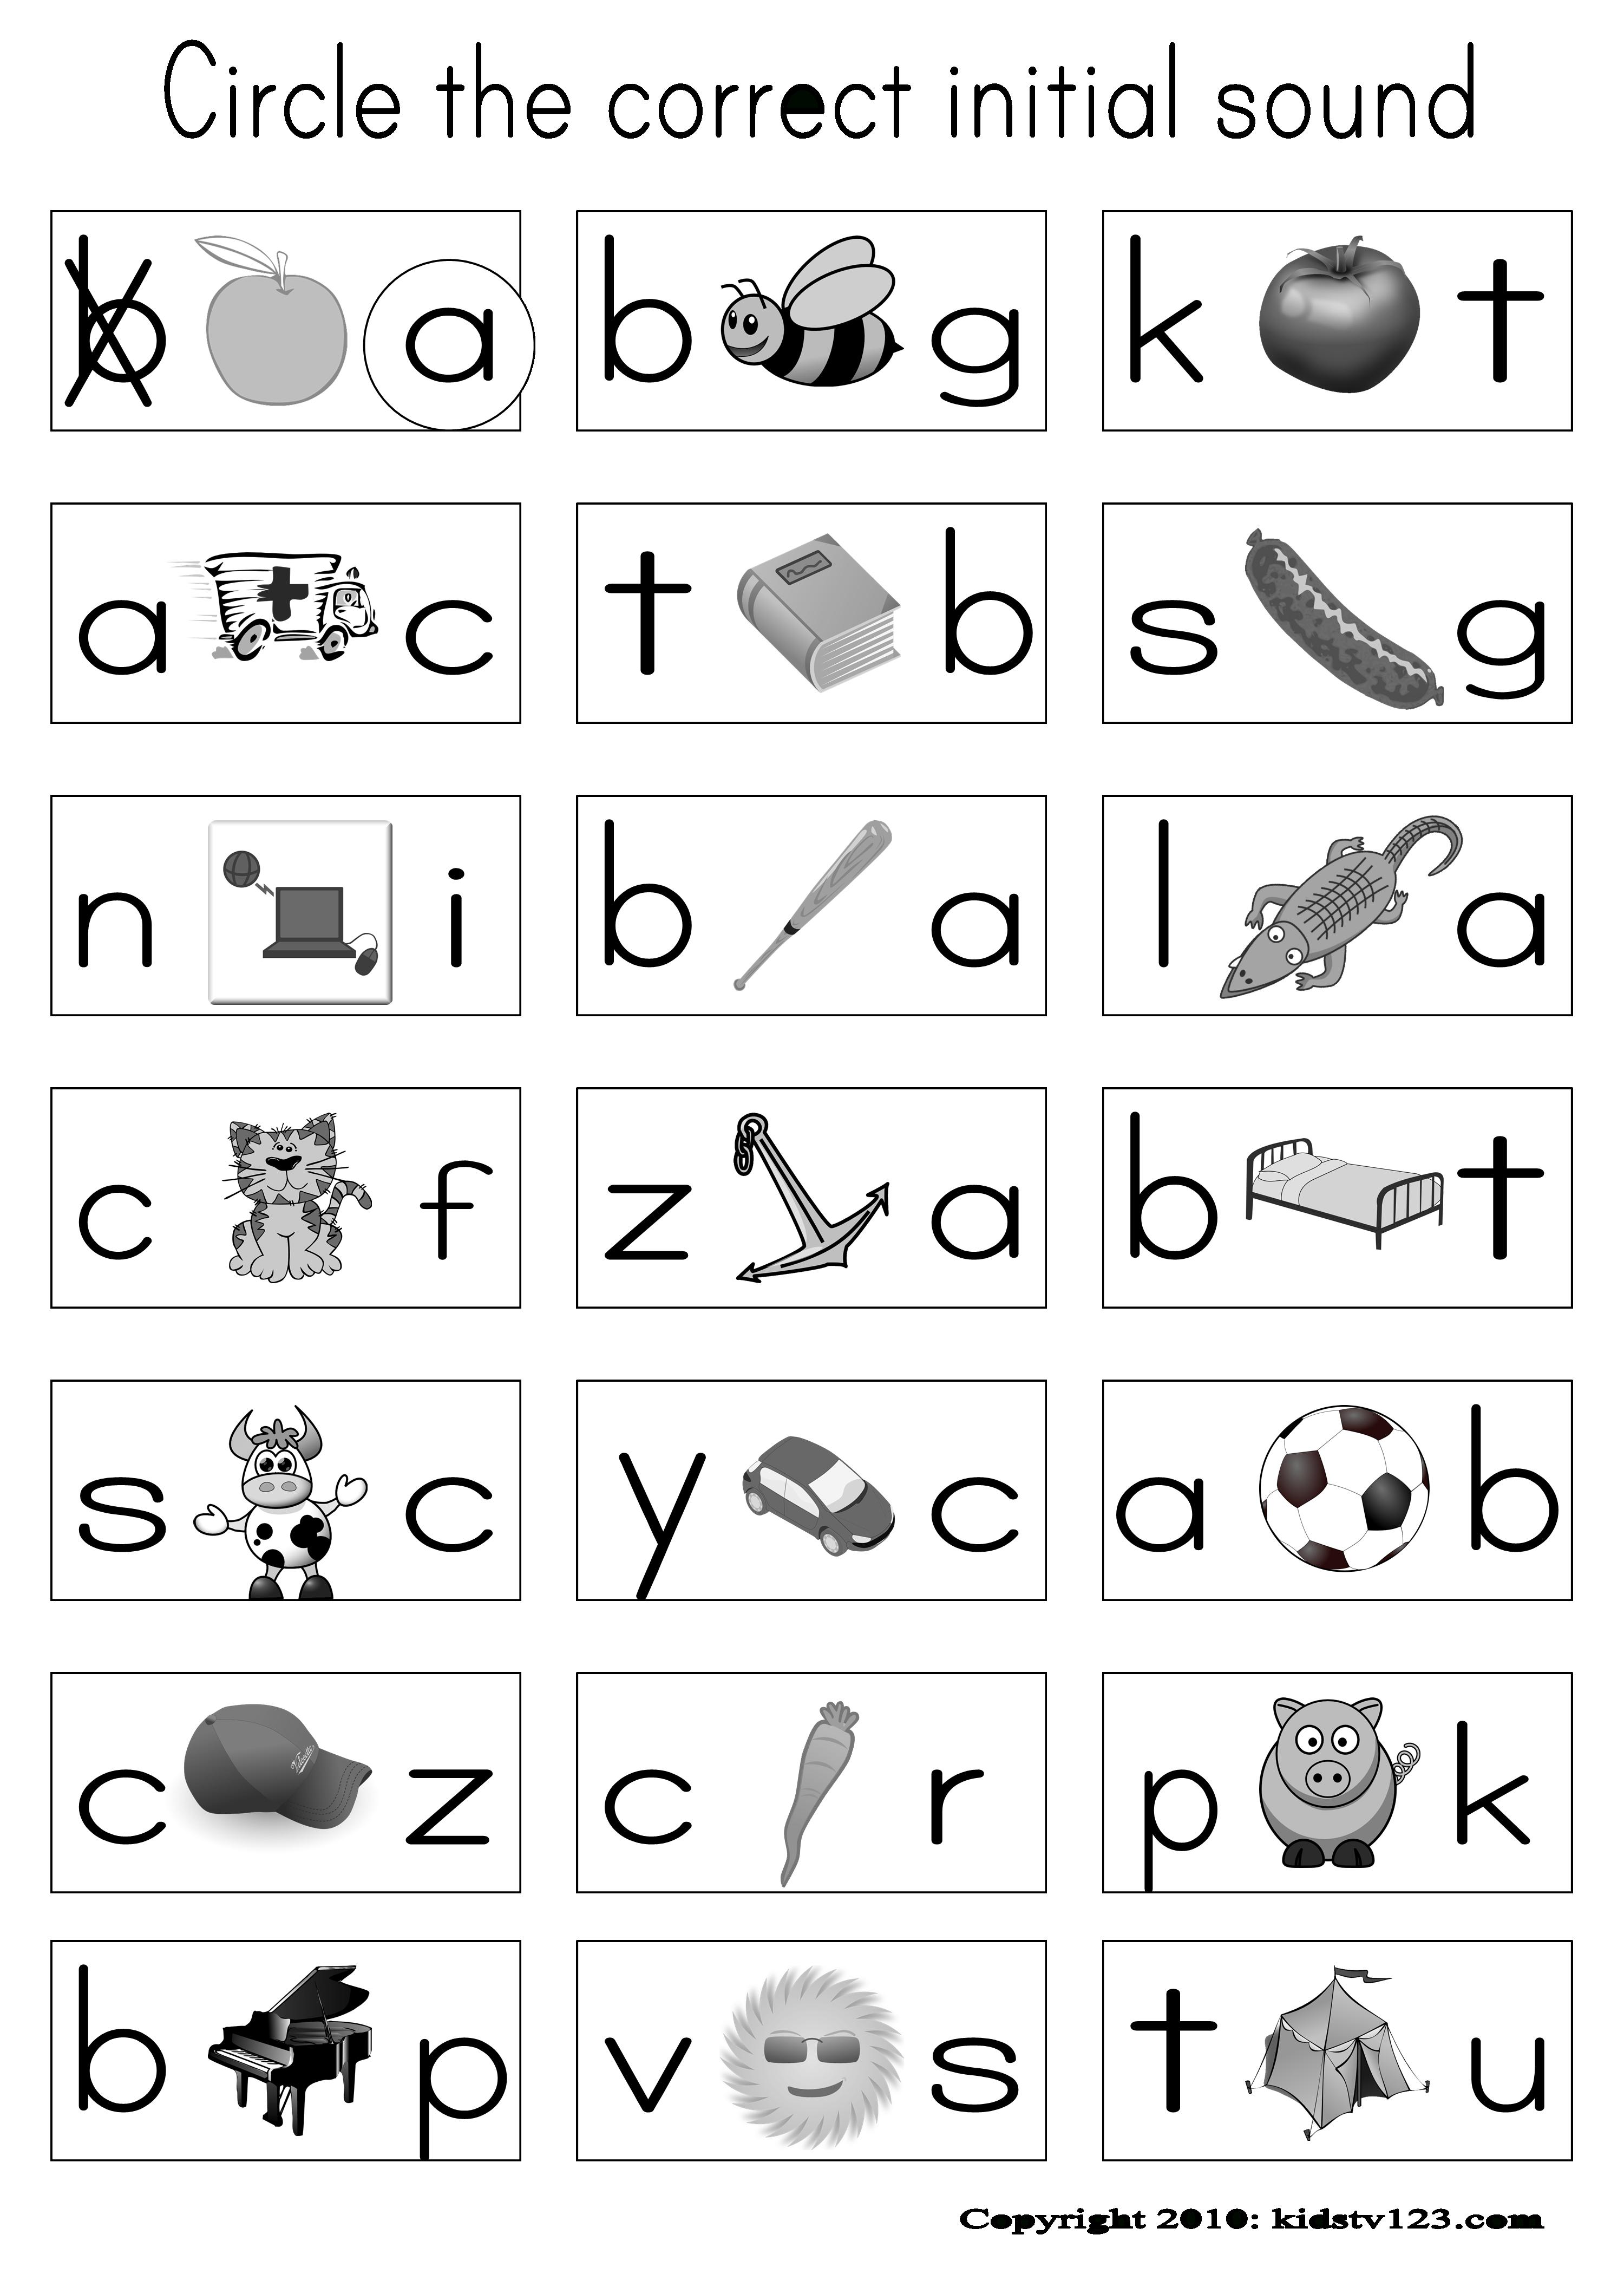 Alphabet & Phonics Worksheets Or Assessment Paper | Abc's - Free Printable Phonics Assessments